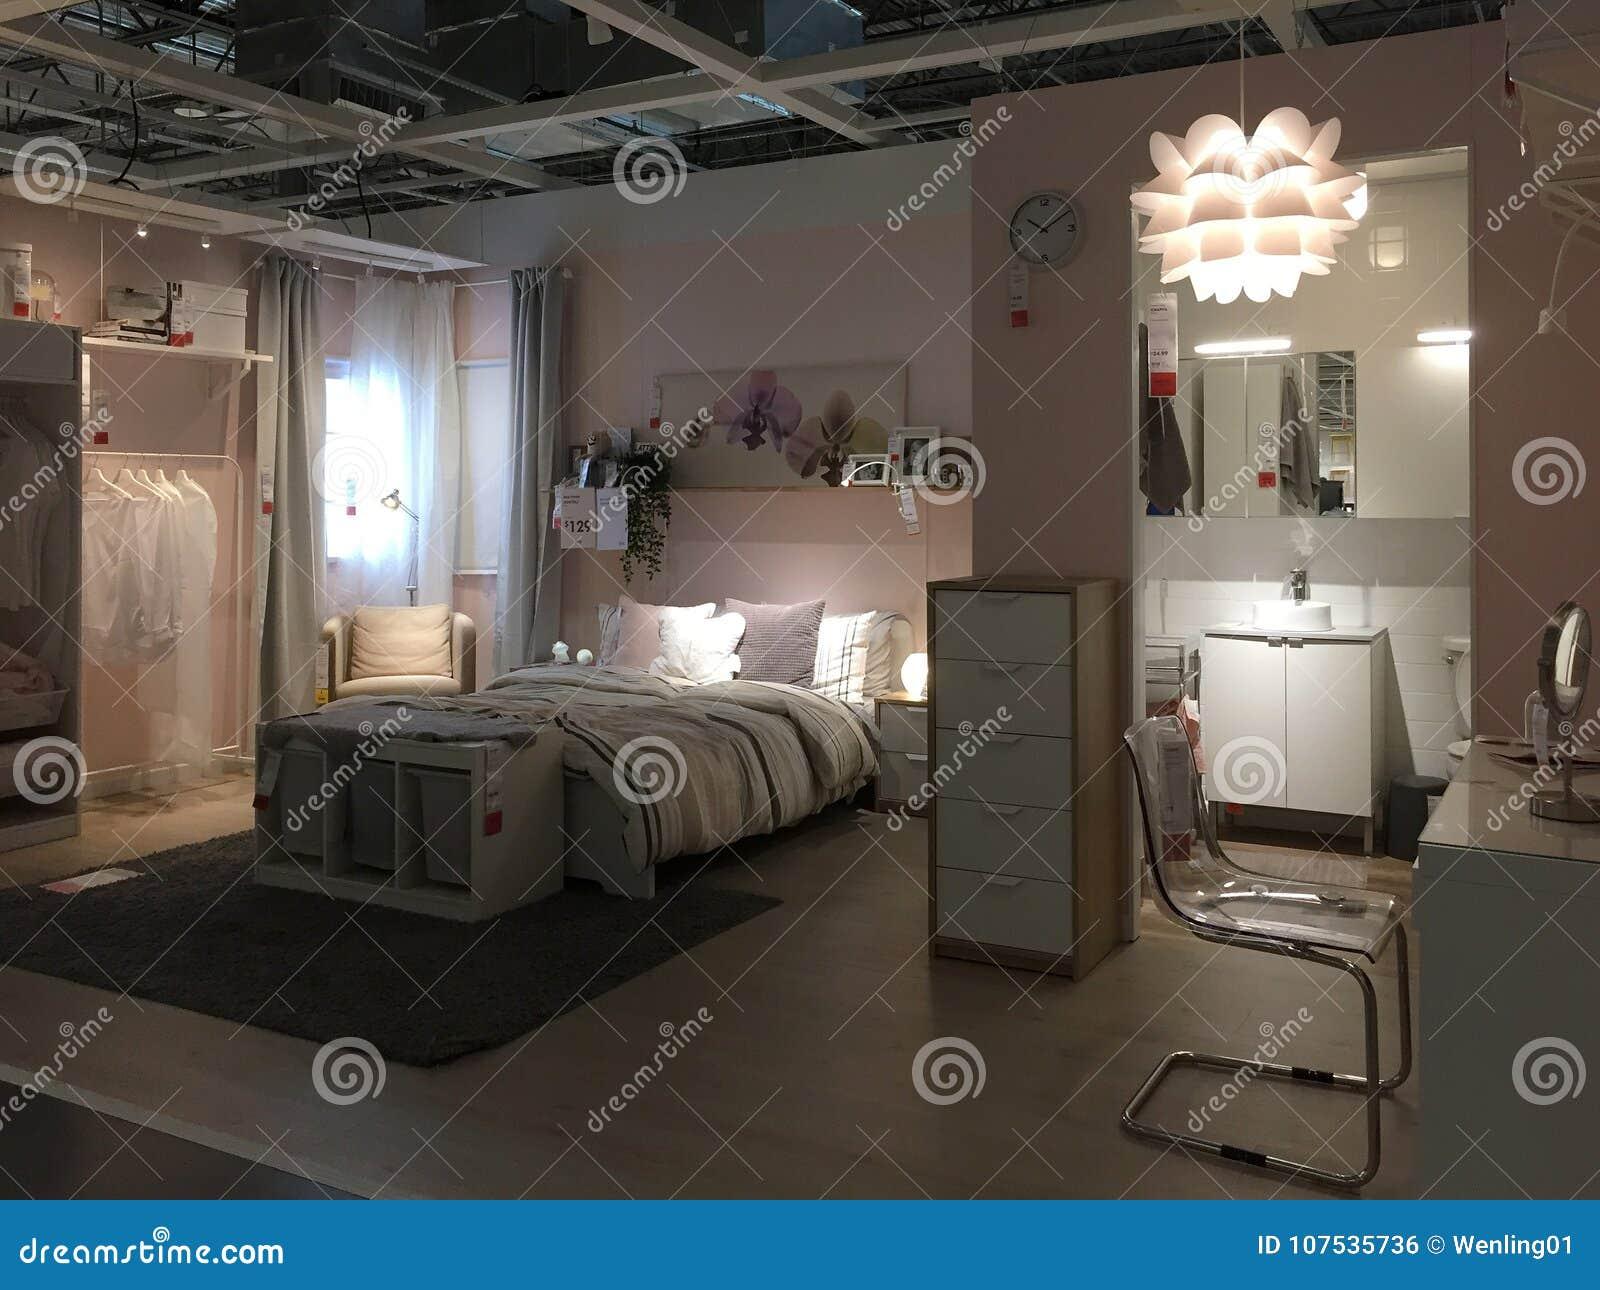 Modern slaapkamer en badkamersontwerp bij opslag IKEA